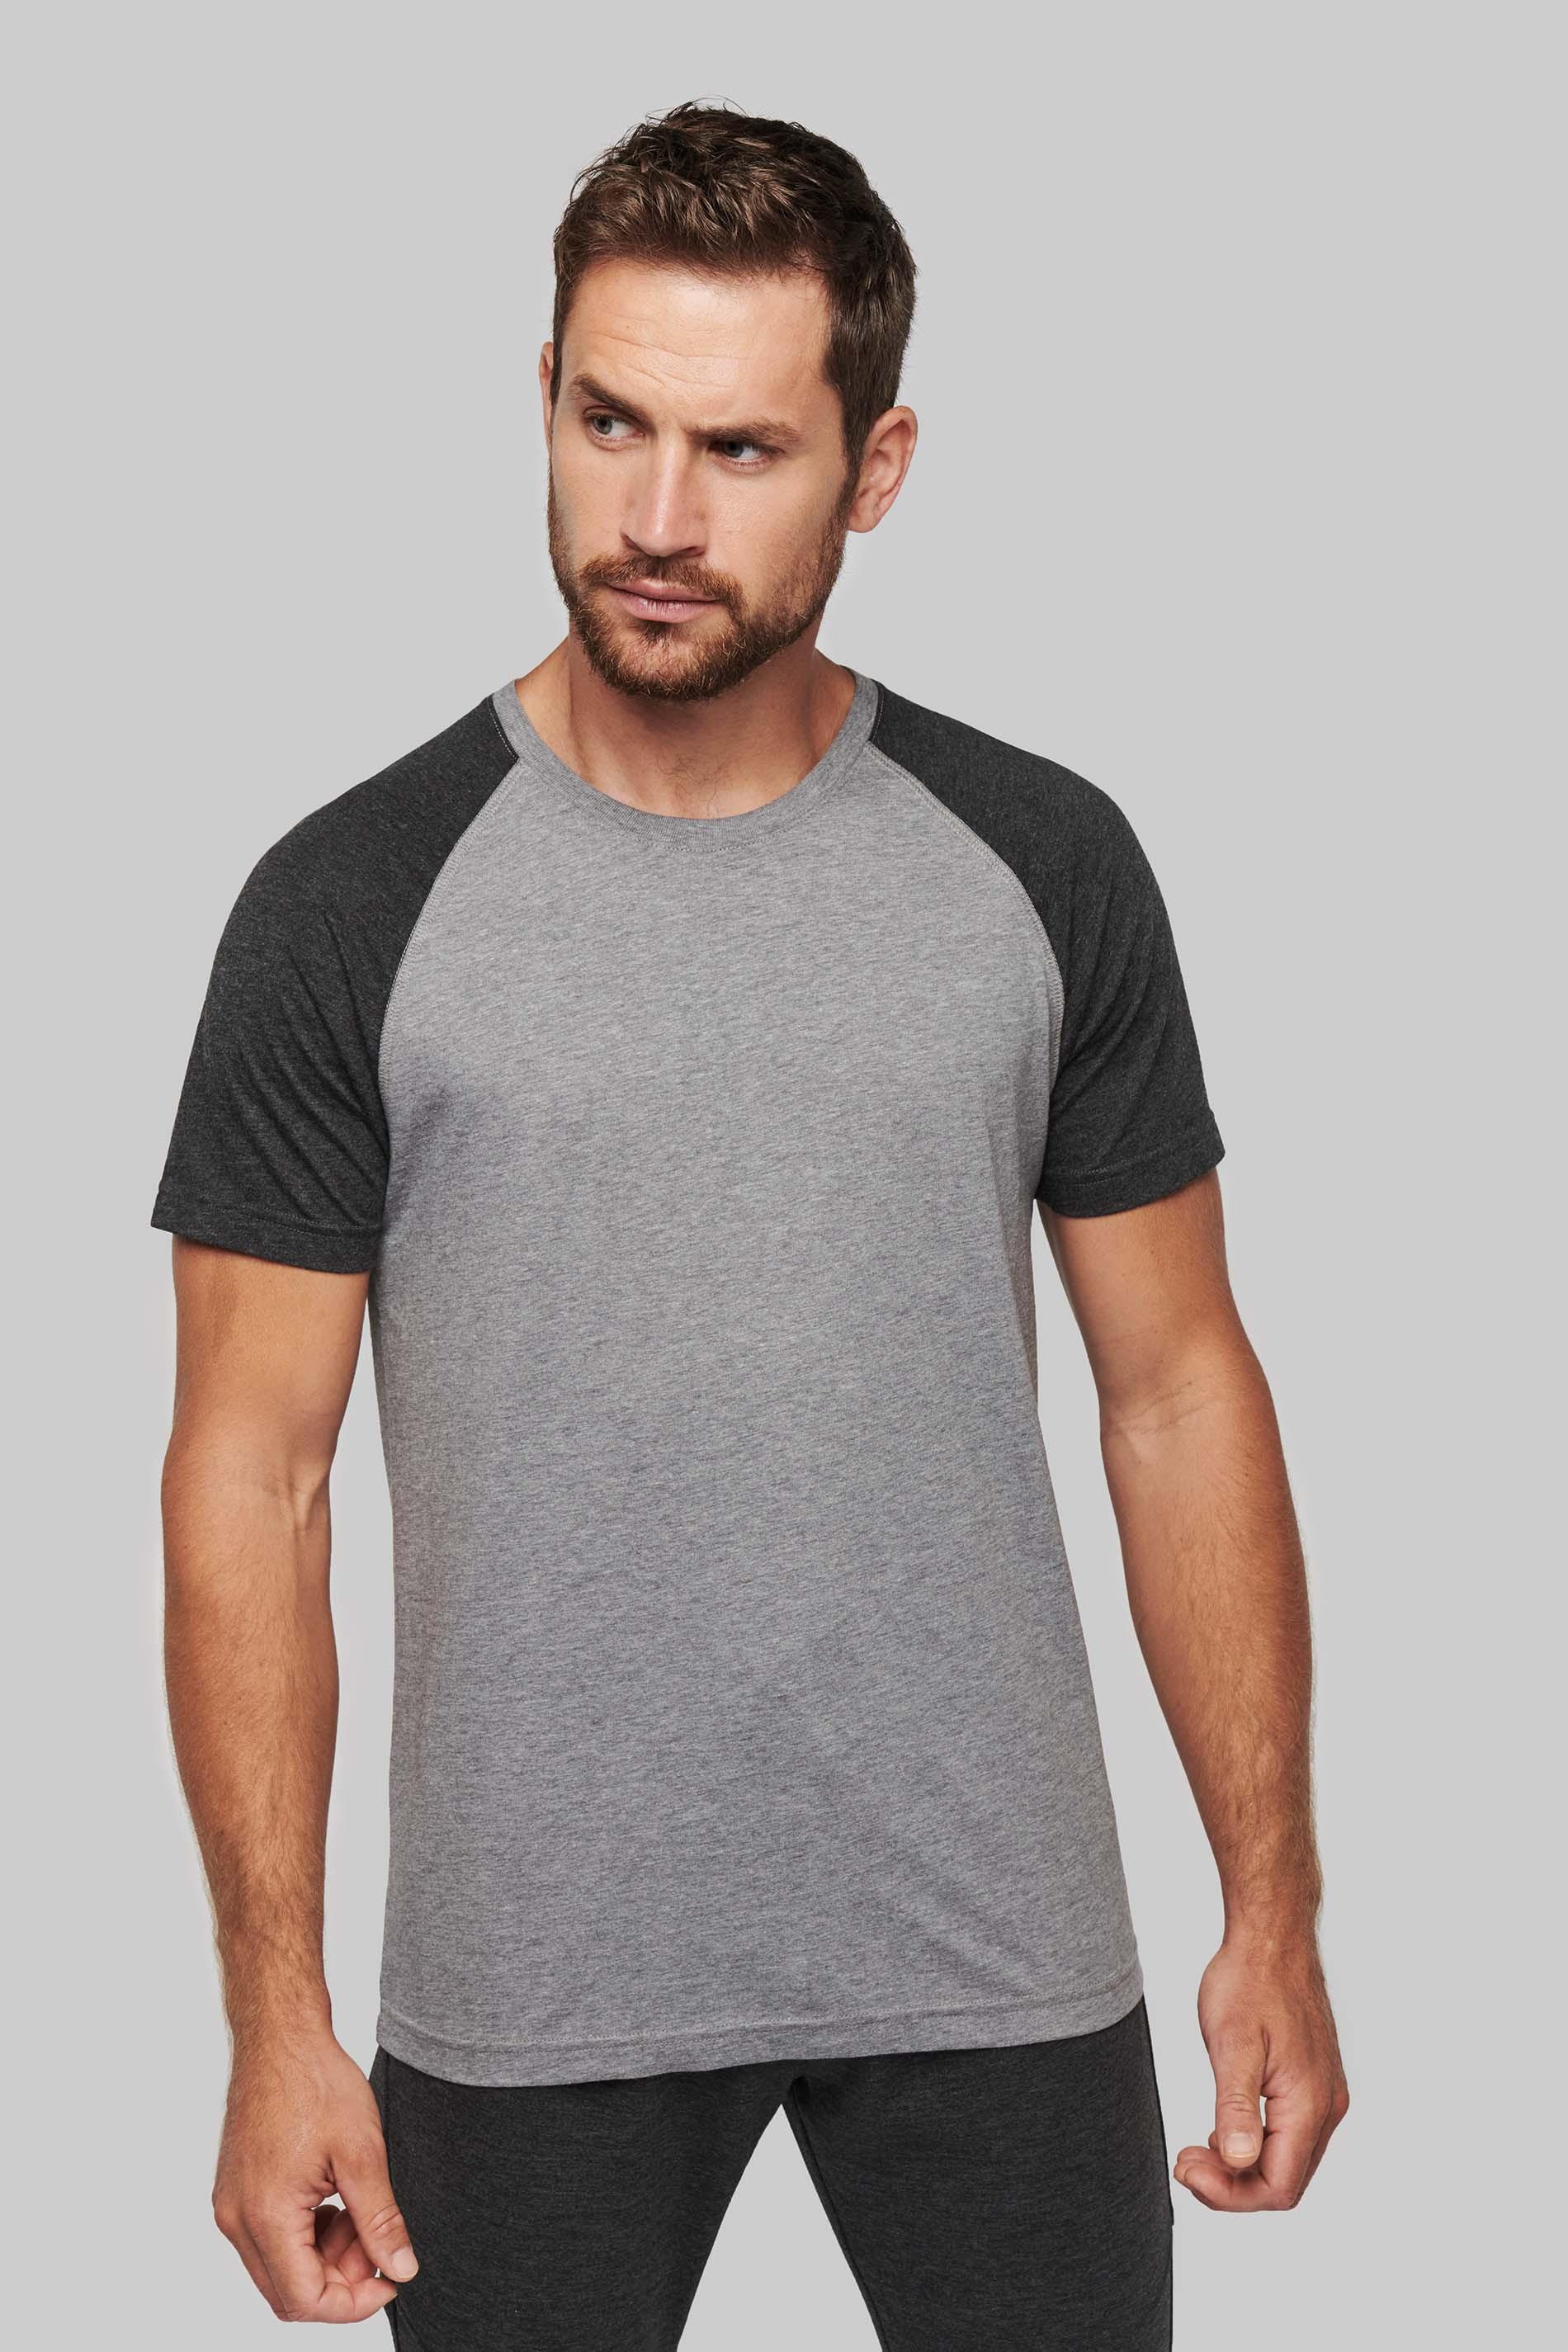 Proact T-shirt bicolore sport manches courtes adulte